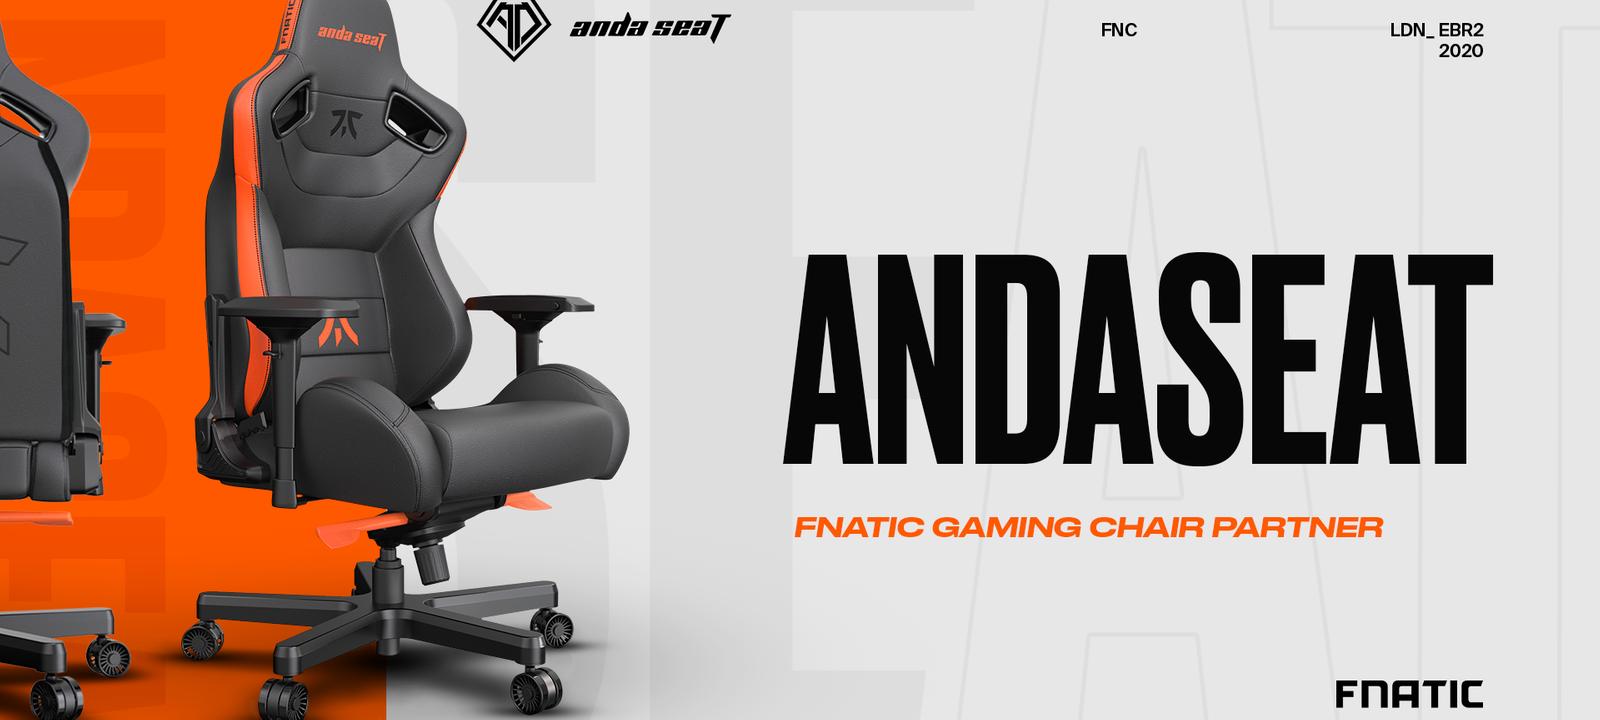 Anda seat with Fnatic branding